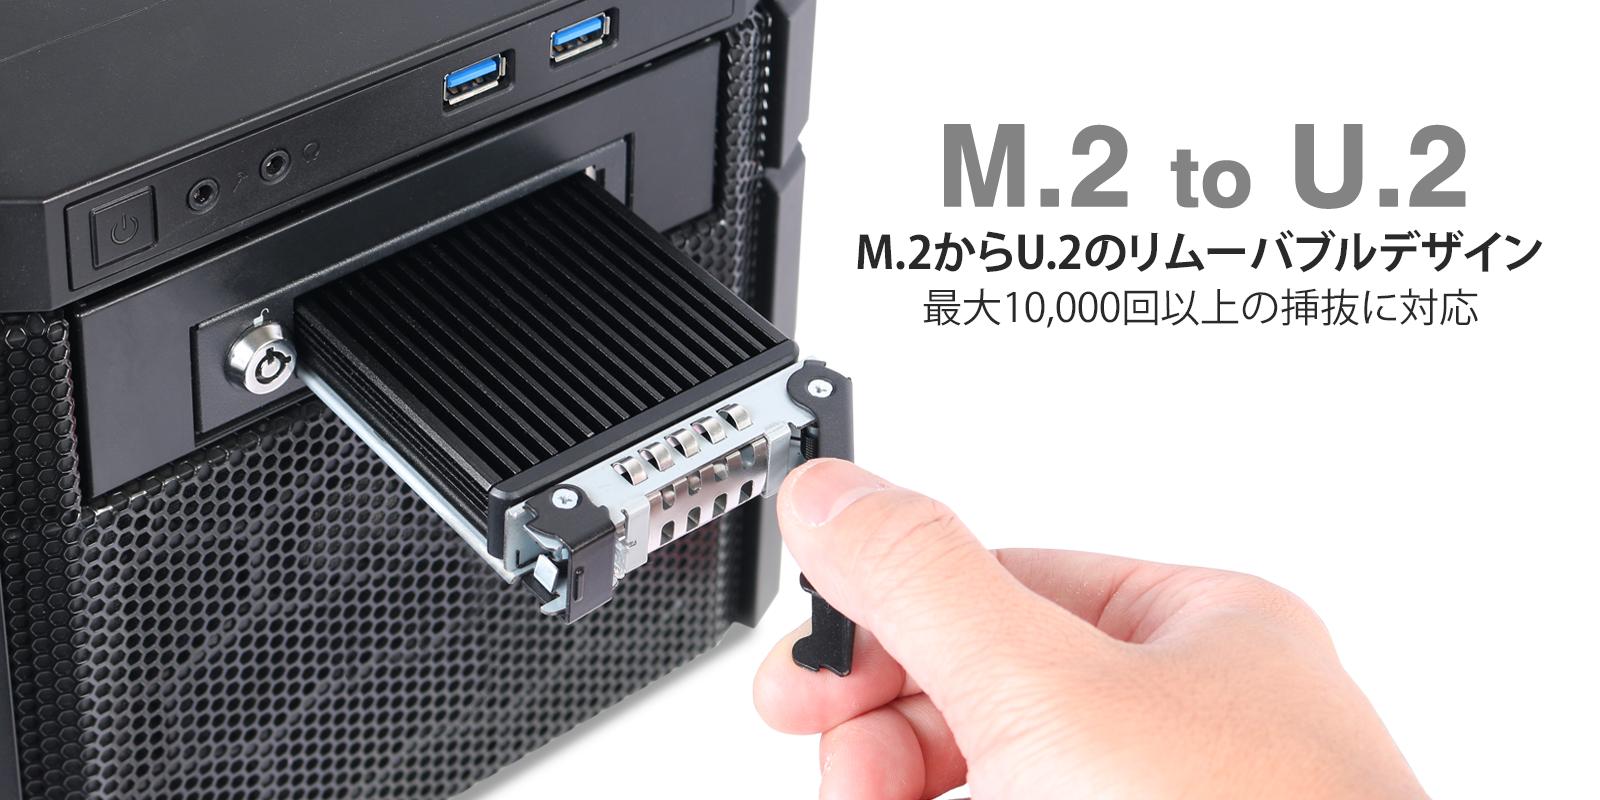 mb601m2k-1b ホットスワップ 可能な M.2 SSD リムーバブルケース